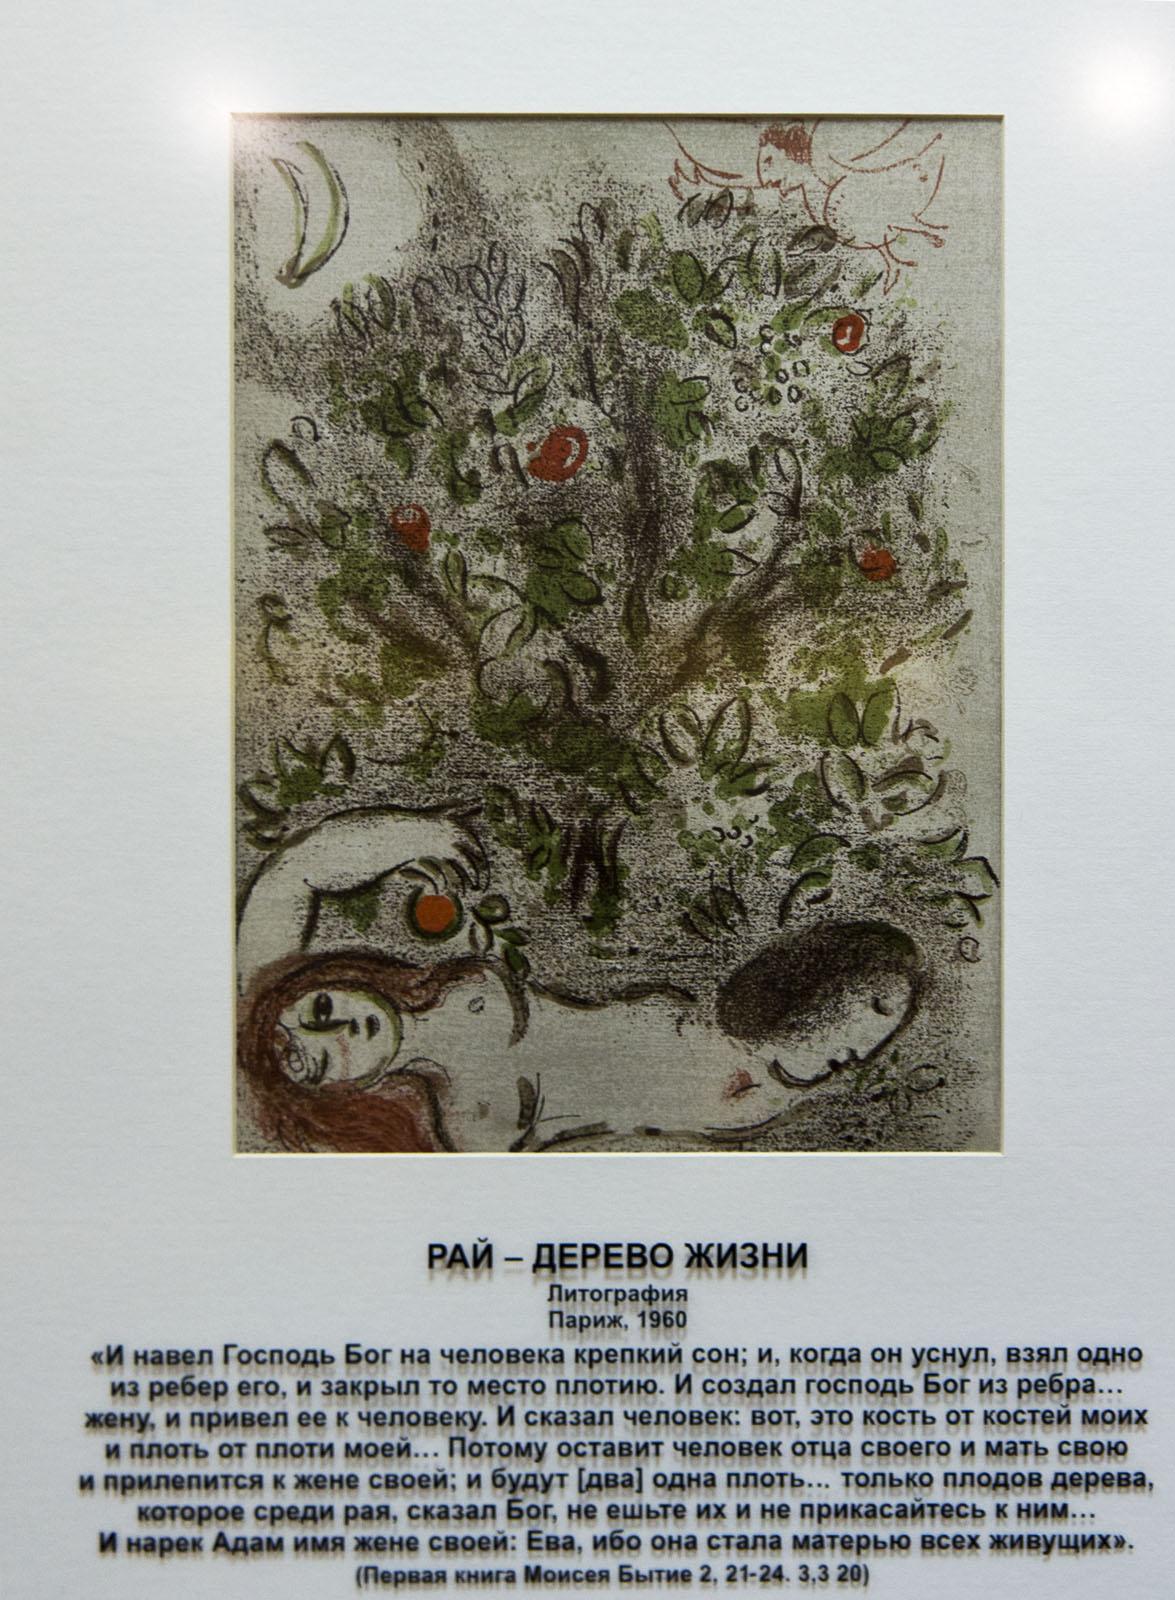 Фото №74476. «Рай дерево жизни», Марк Шагал, литография, Париж, 1960